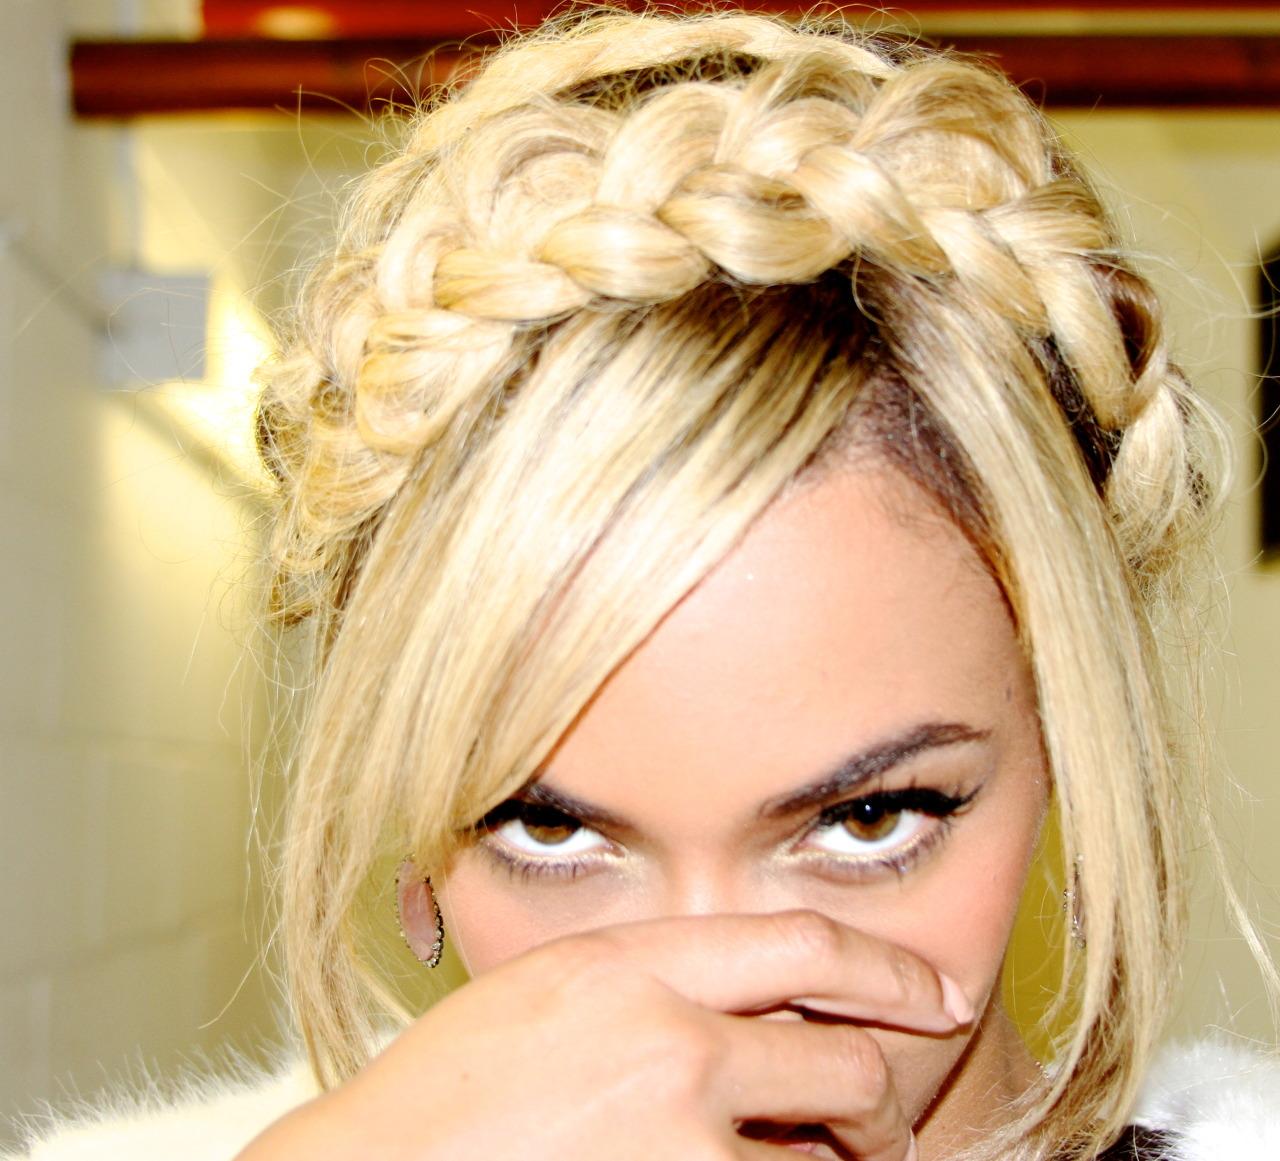 Beyoncé - Twitter (@Beyonce), Instagram (Baddiebey), Tumblr (I Am...) [II] - Página 3 Tumblr_n0z01s0ZfK1rqgjz2o1_1280